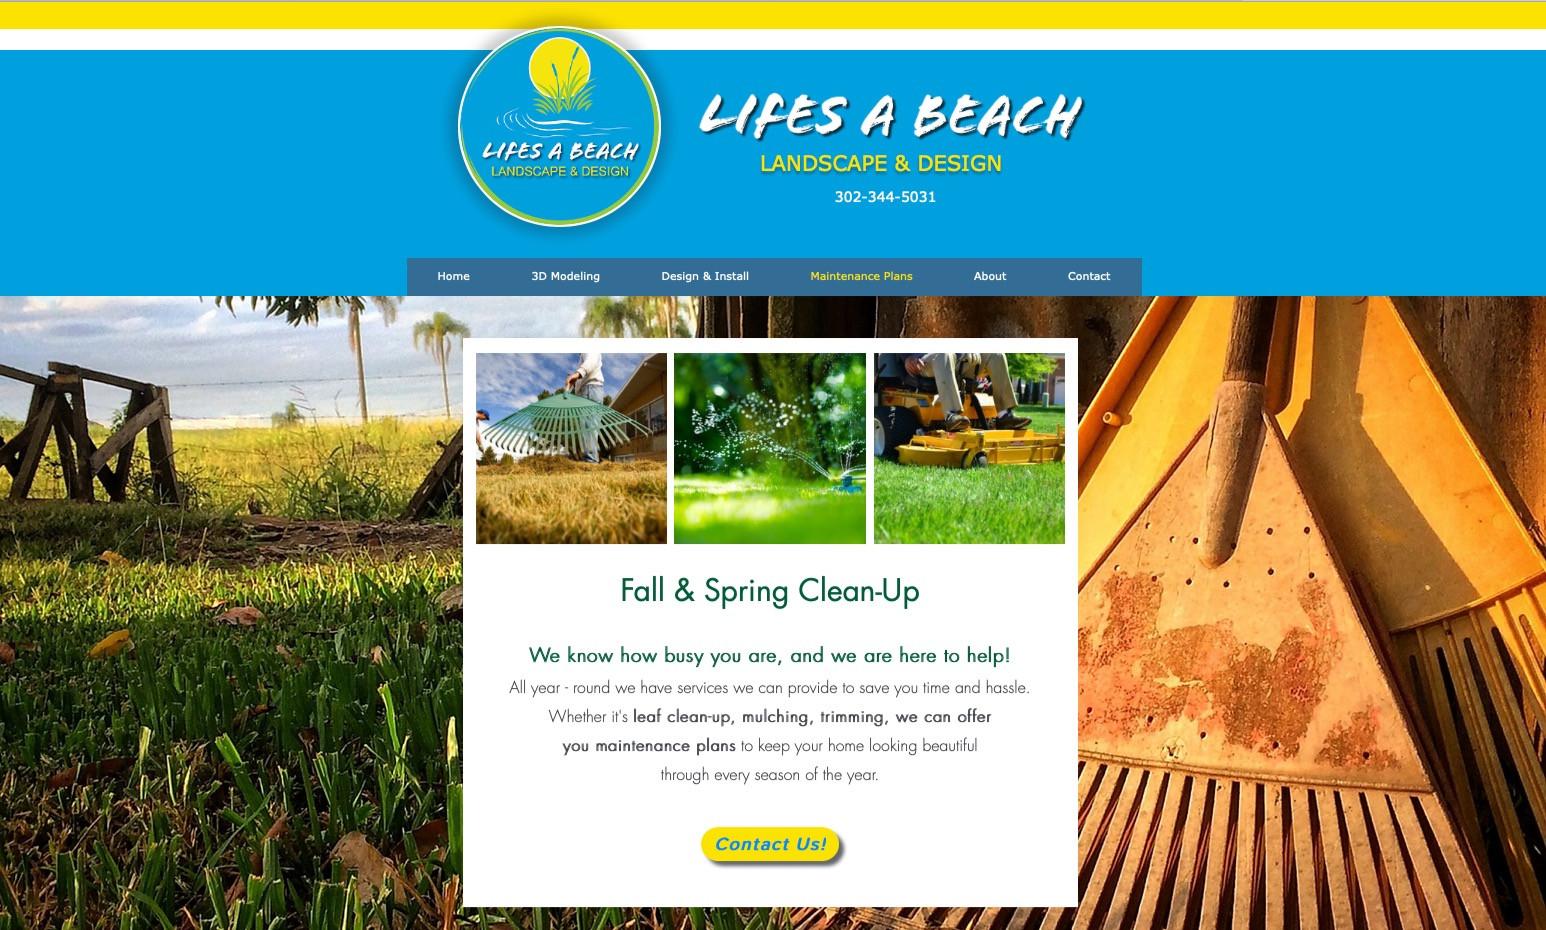 lifesabeachlandscape.com